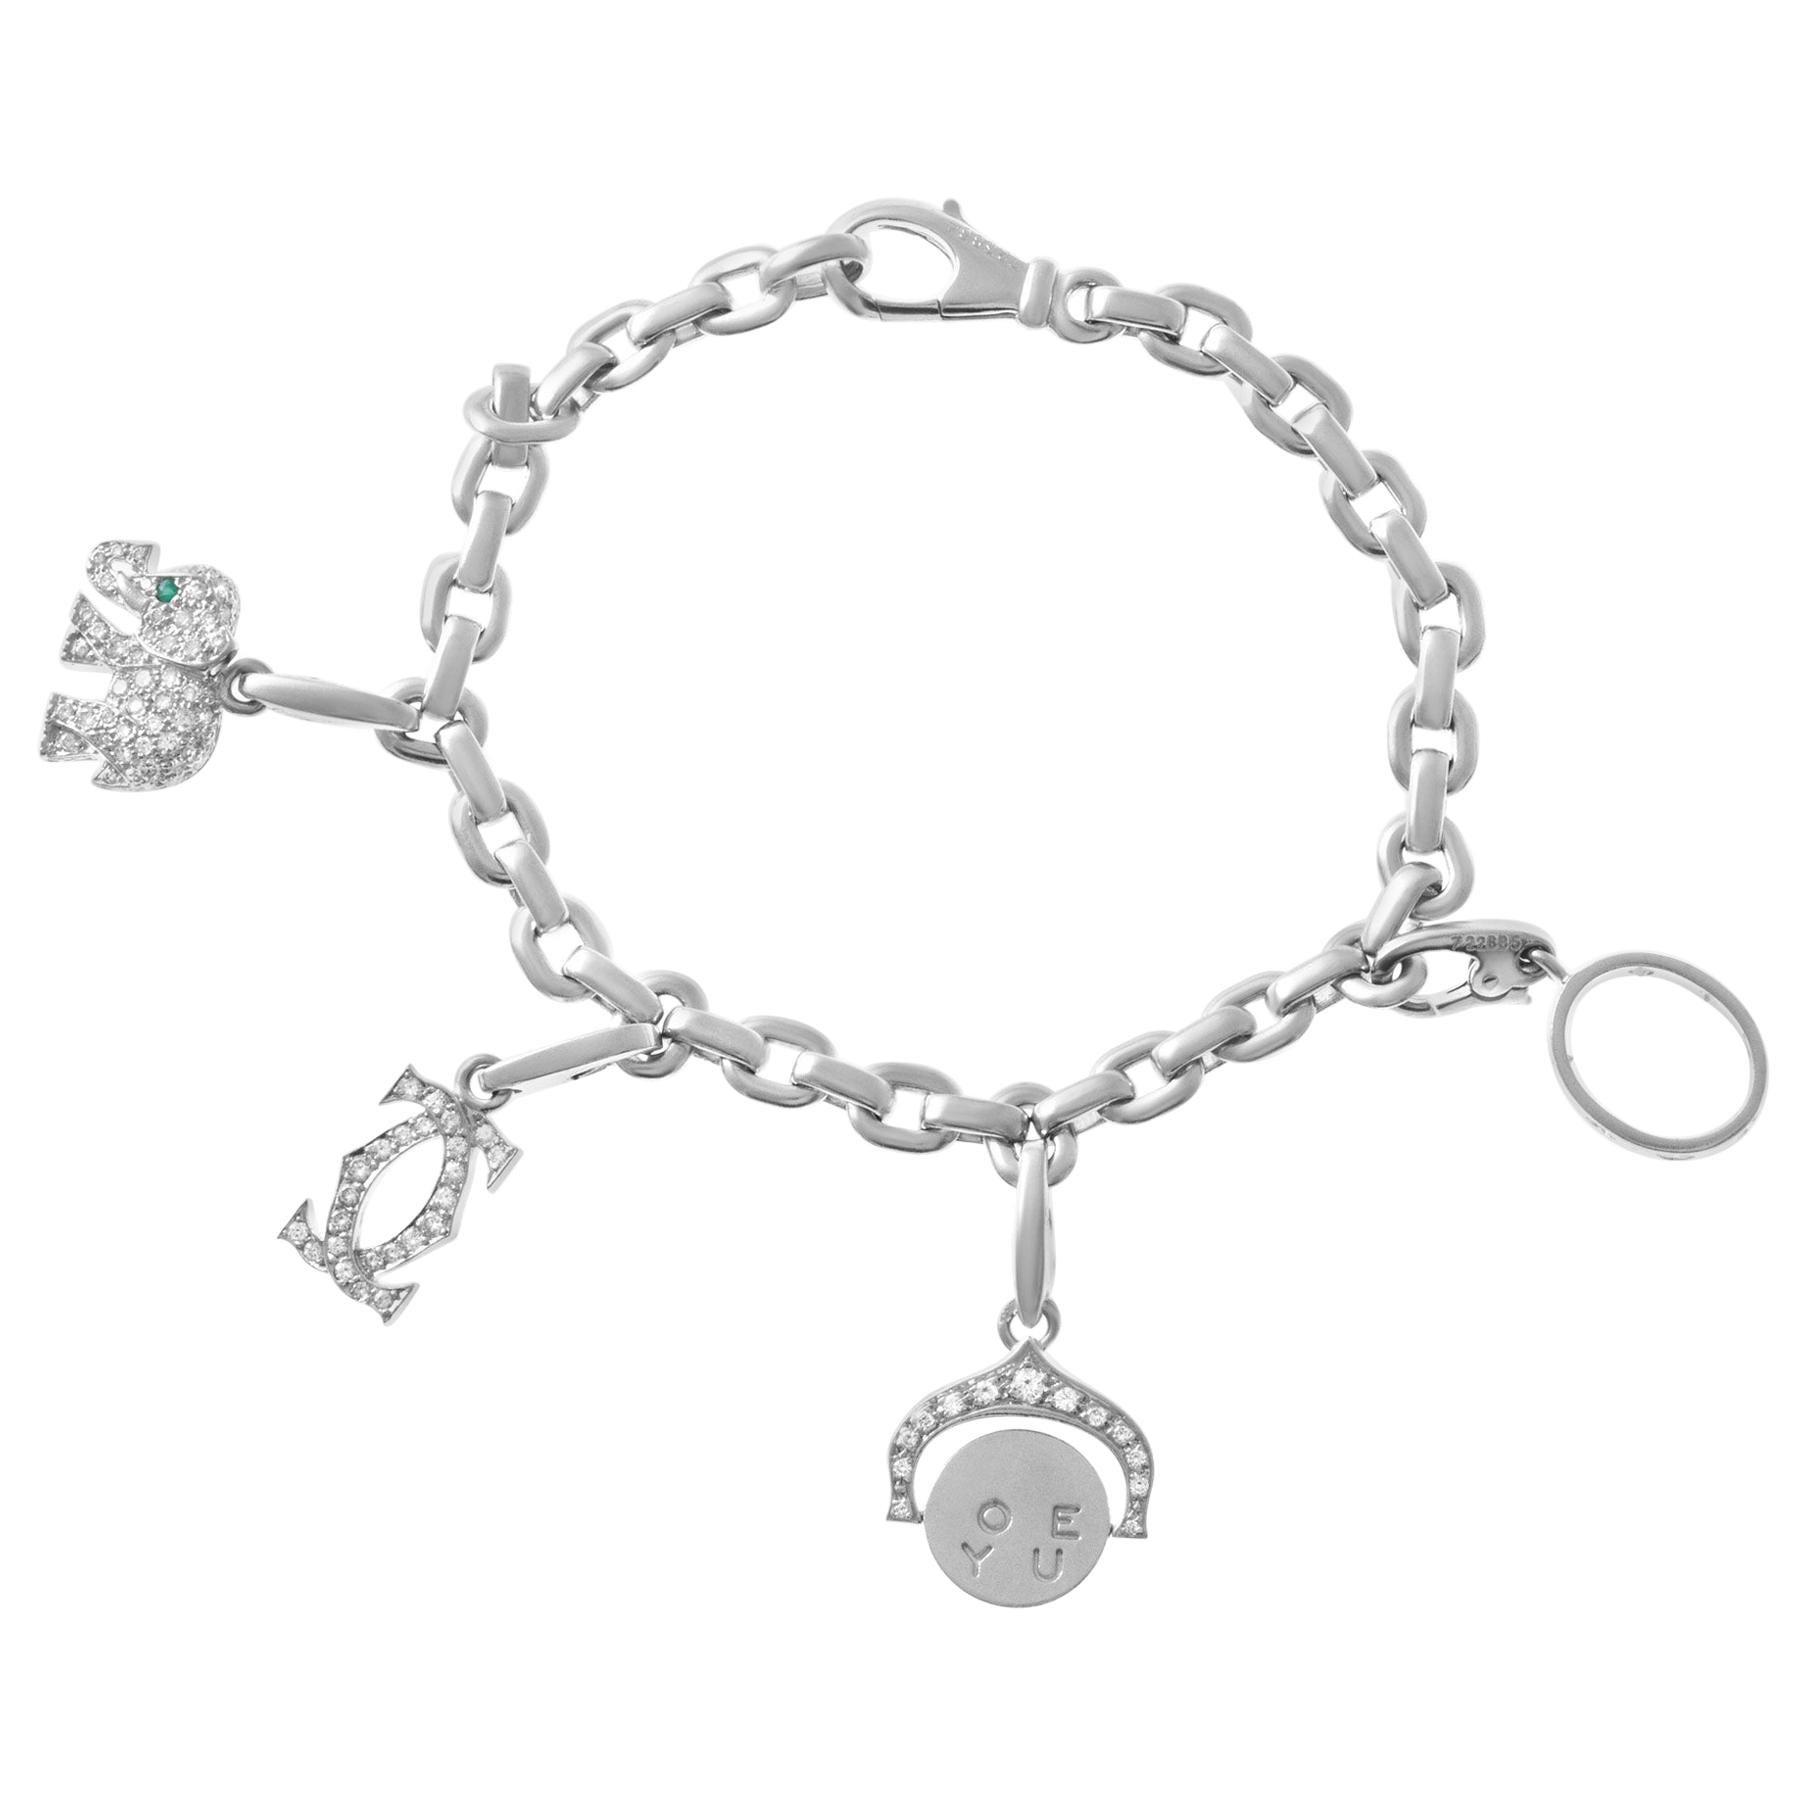 Cartier Charm Bracelet in 18 Karat White Gold with Diamond Charms